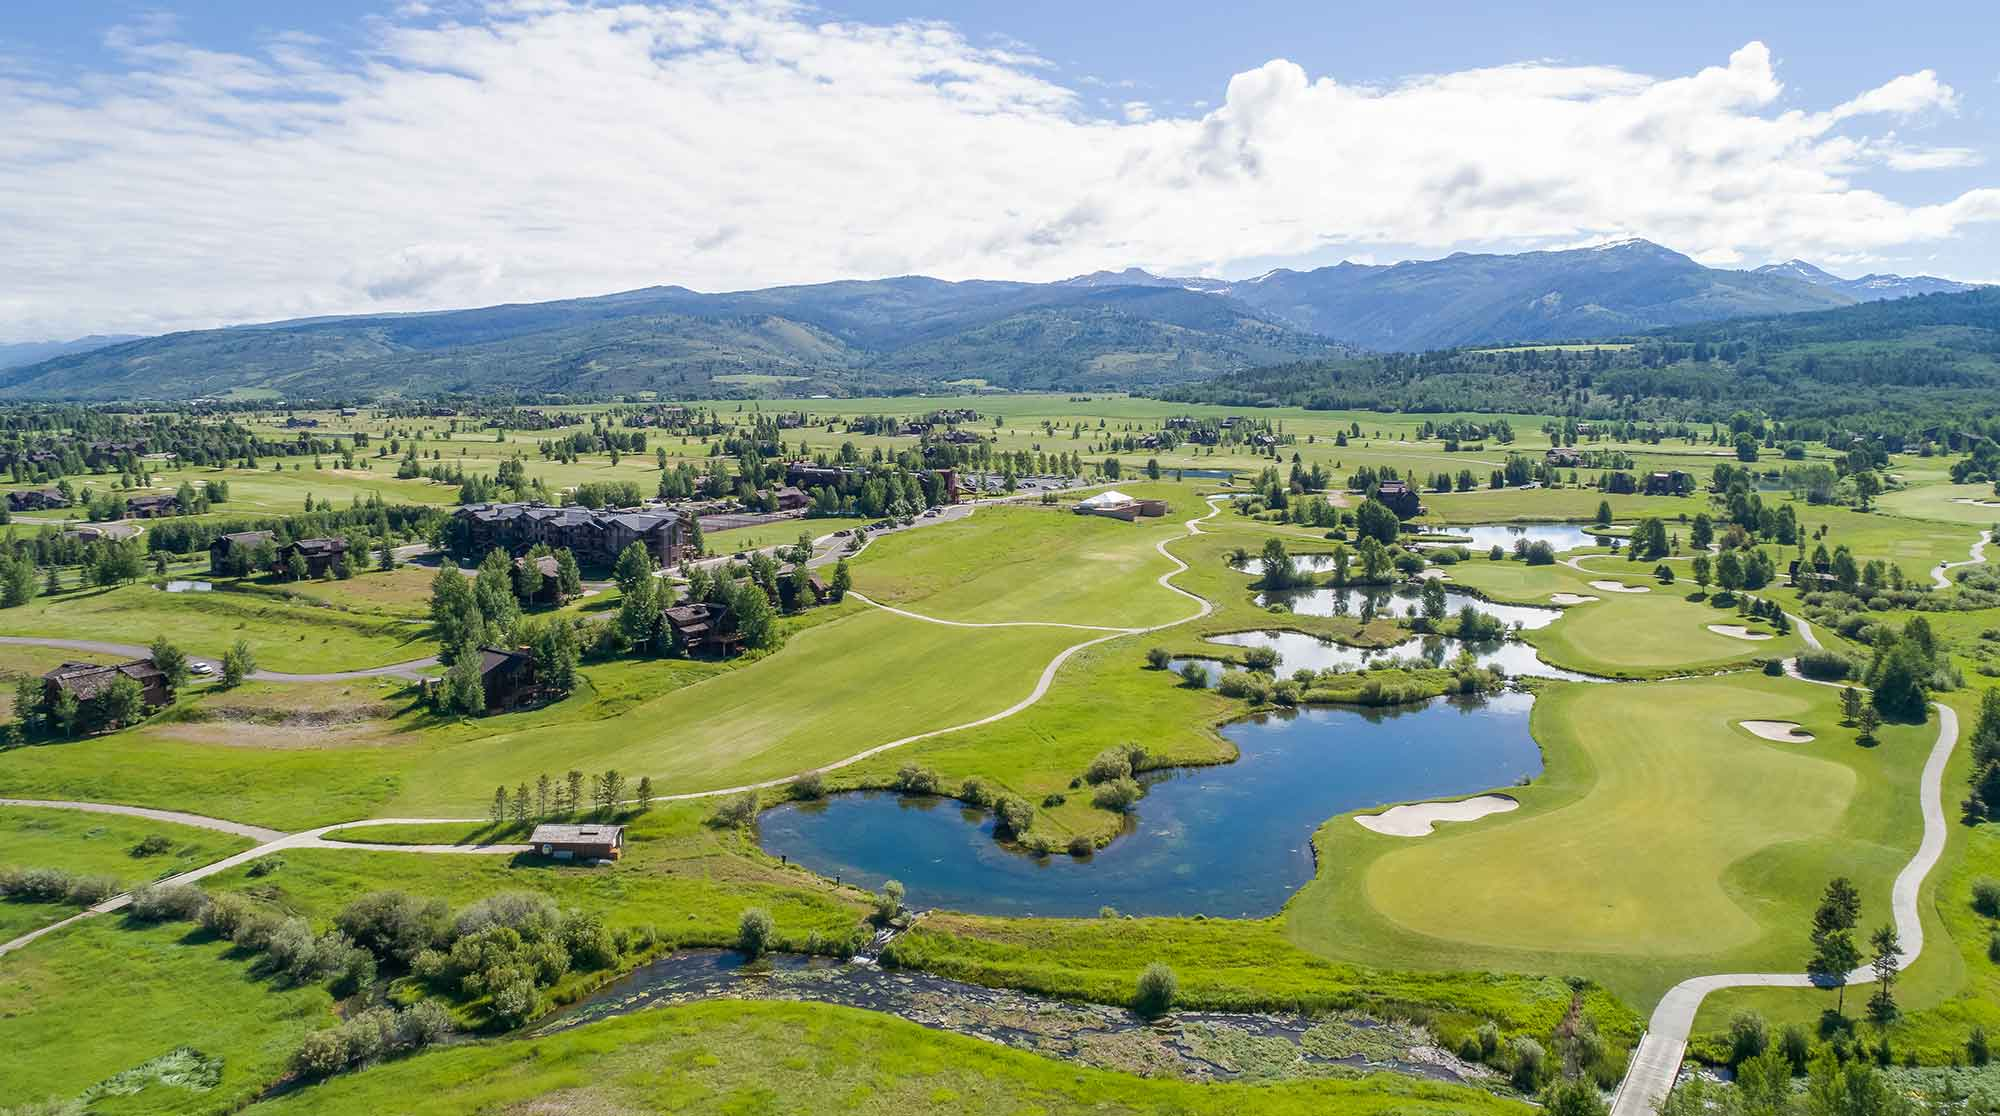 Teton Springs Lodge Aerial View